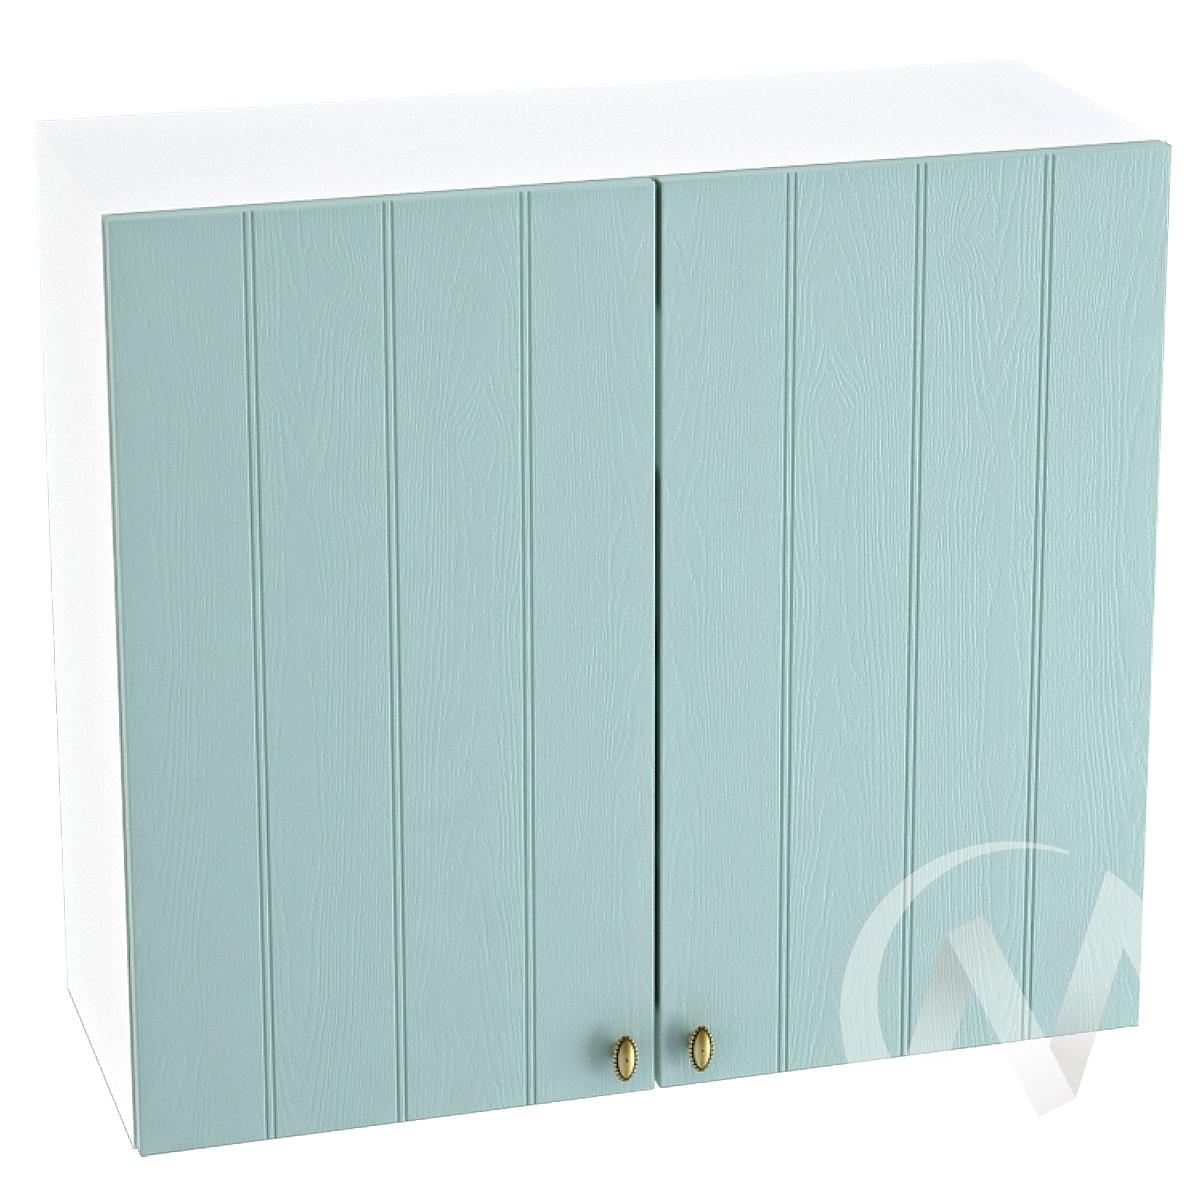 "Кухня ""Прованс"": Шкаф верхний 800, ШВ 800 (голубой/корпус белый)"